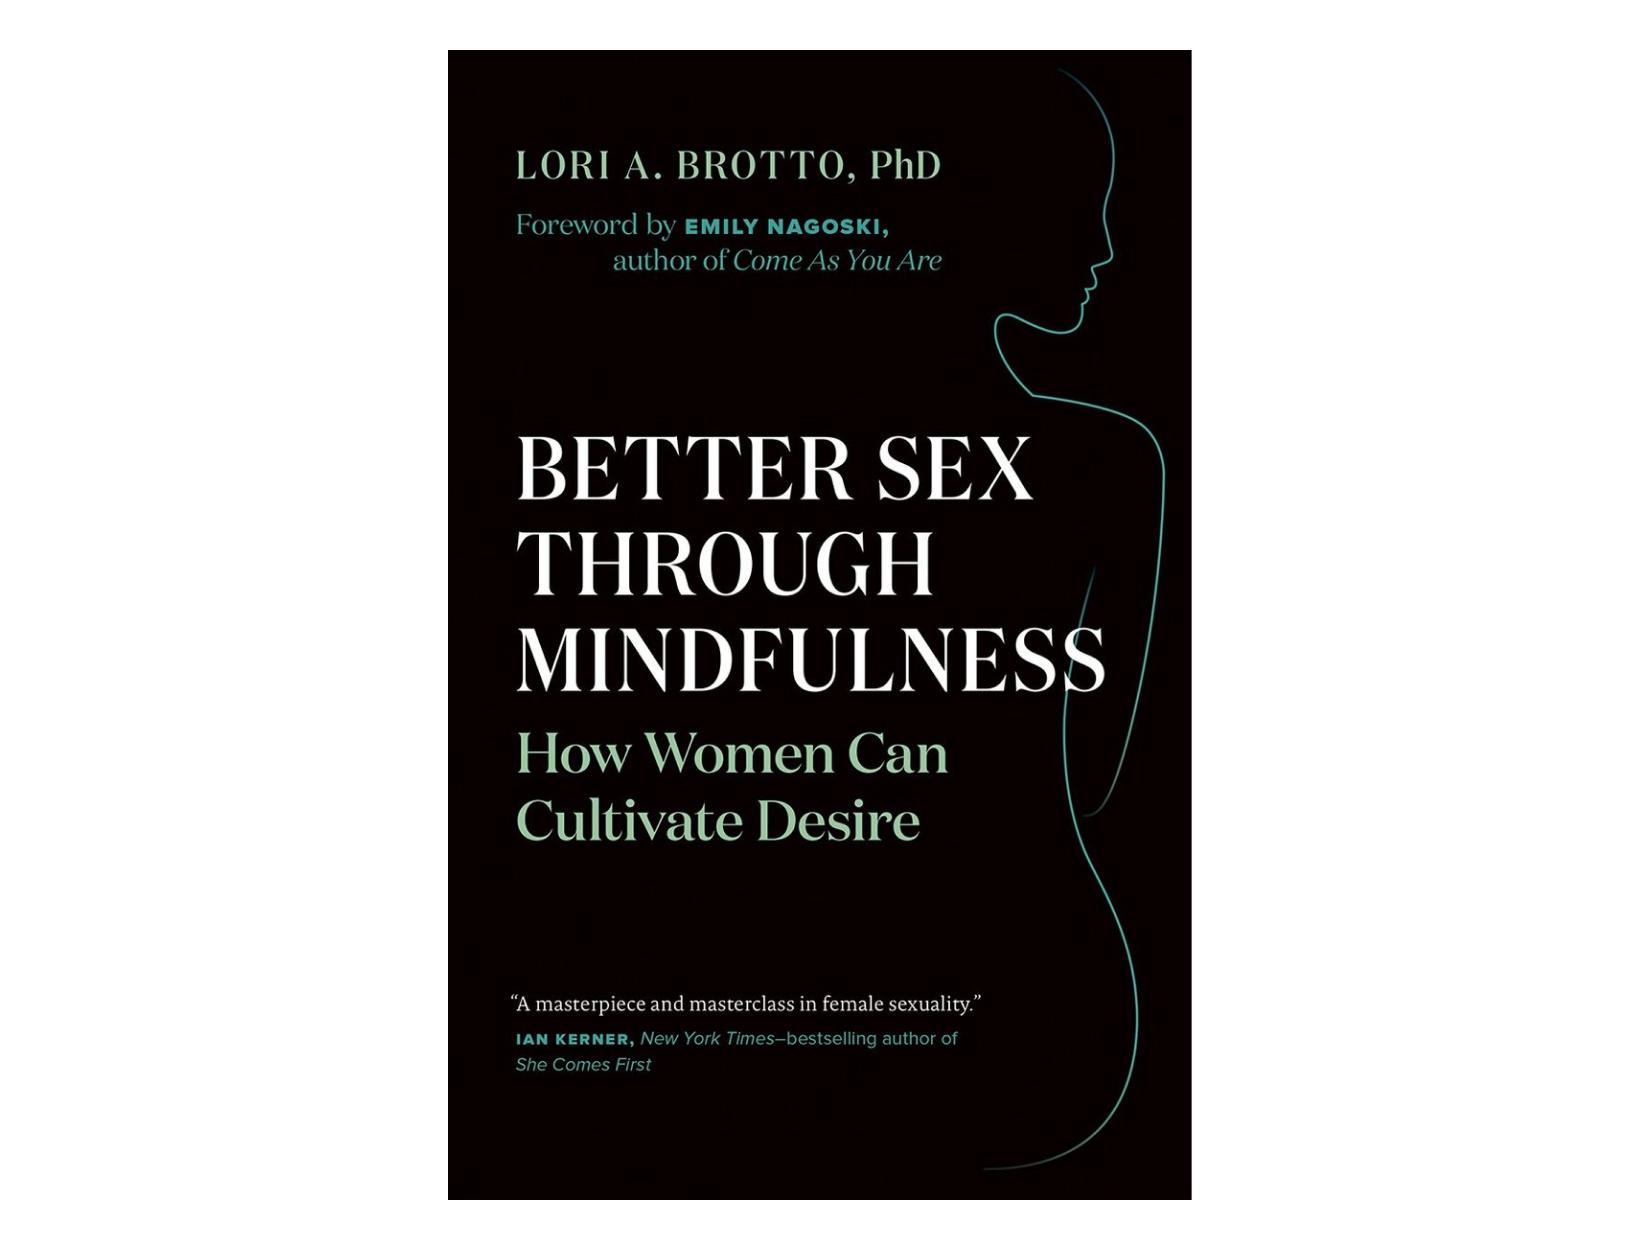 <em>Better Sex through Mindfulness</em> by Lori A. Brotto, PhD